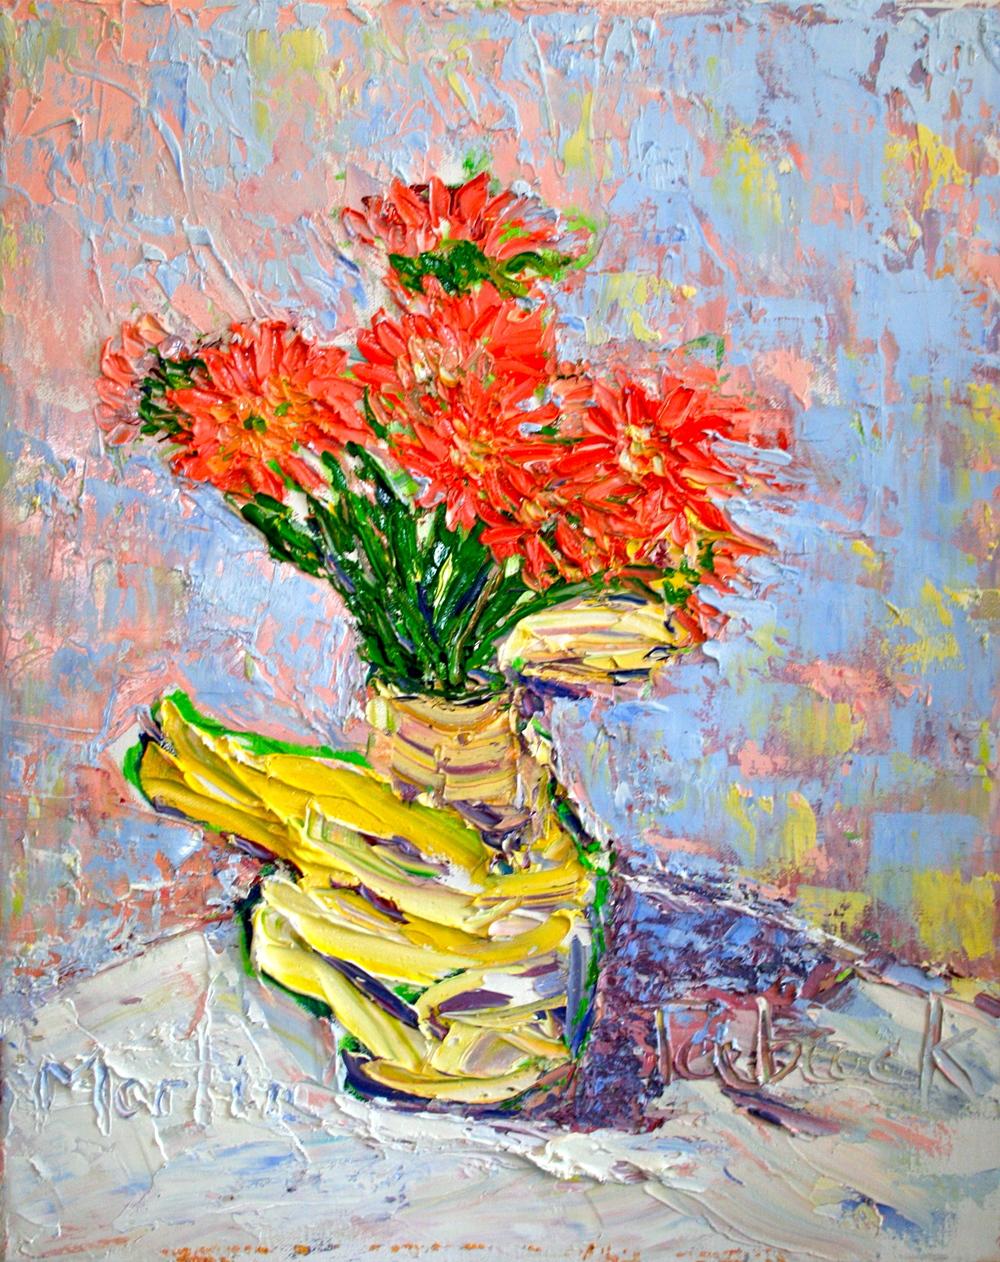 flowers-for-billy-16x20-425.jpg